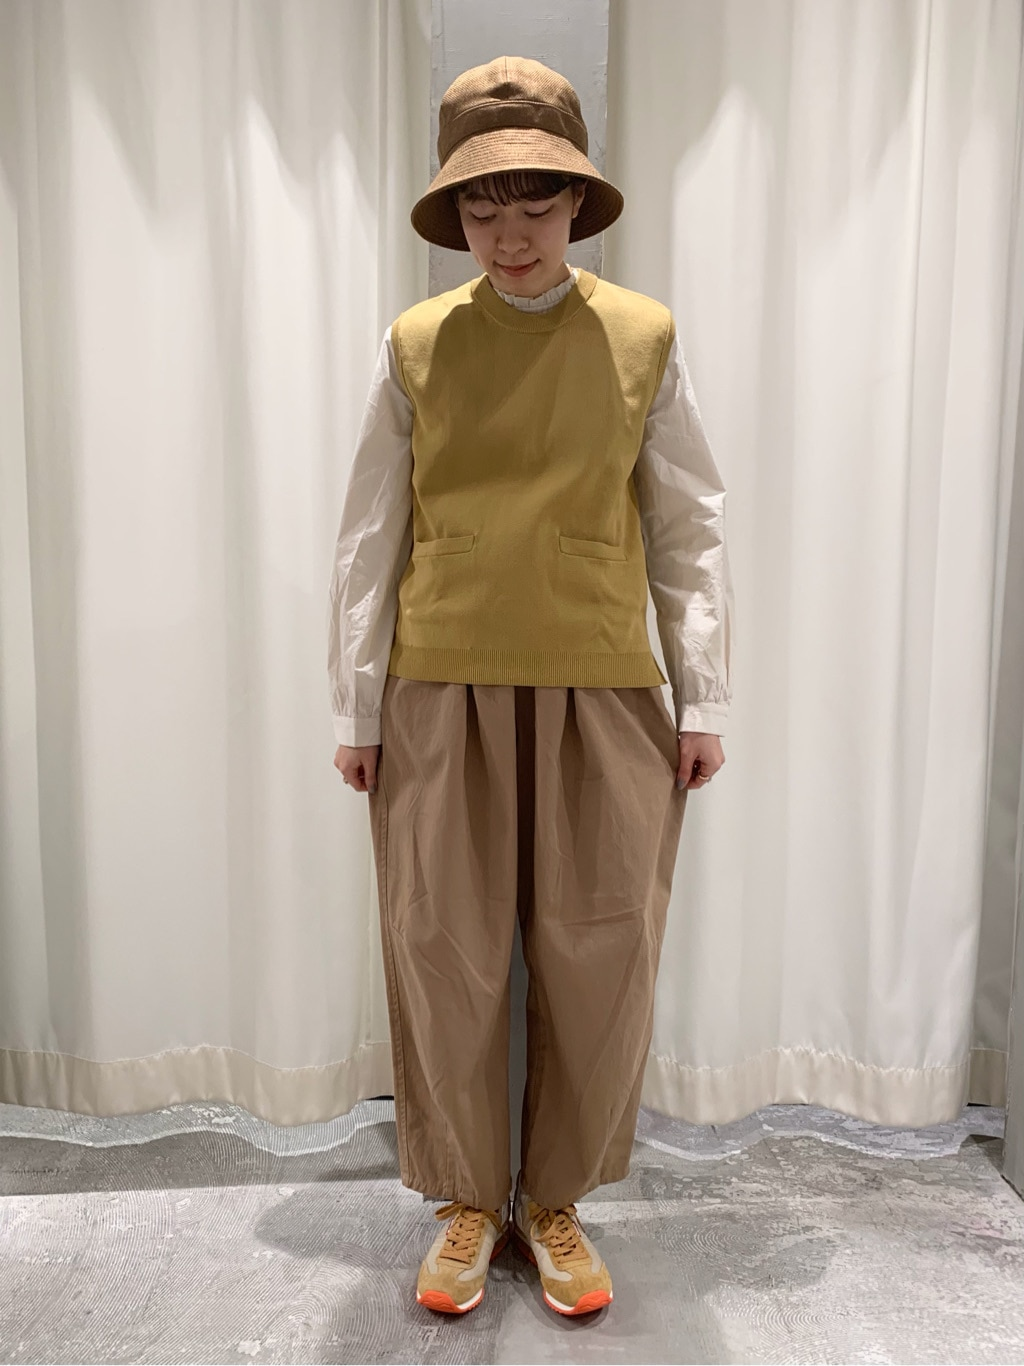 - CHILD WOMAN CHILD WOMAN , PAR ICI ルミネ横浜 身長:158cm 2021.01.29